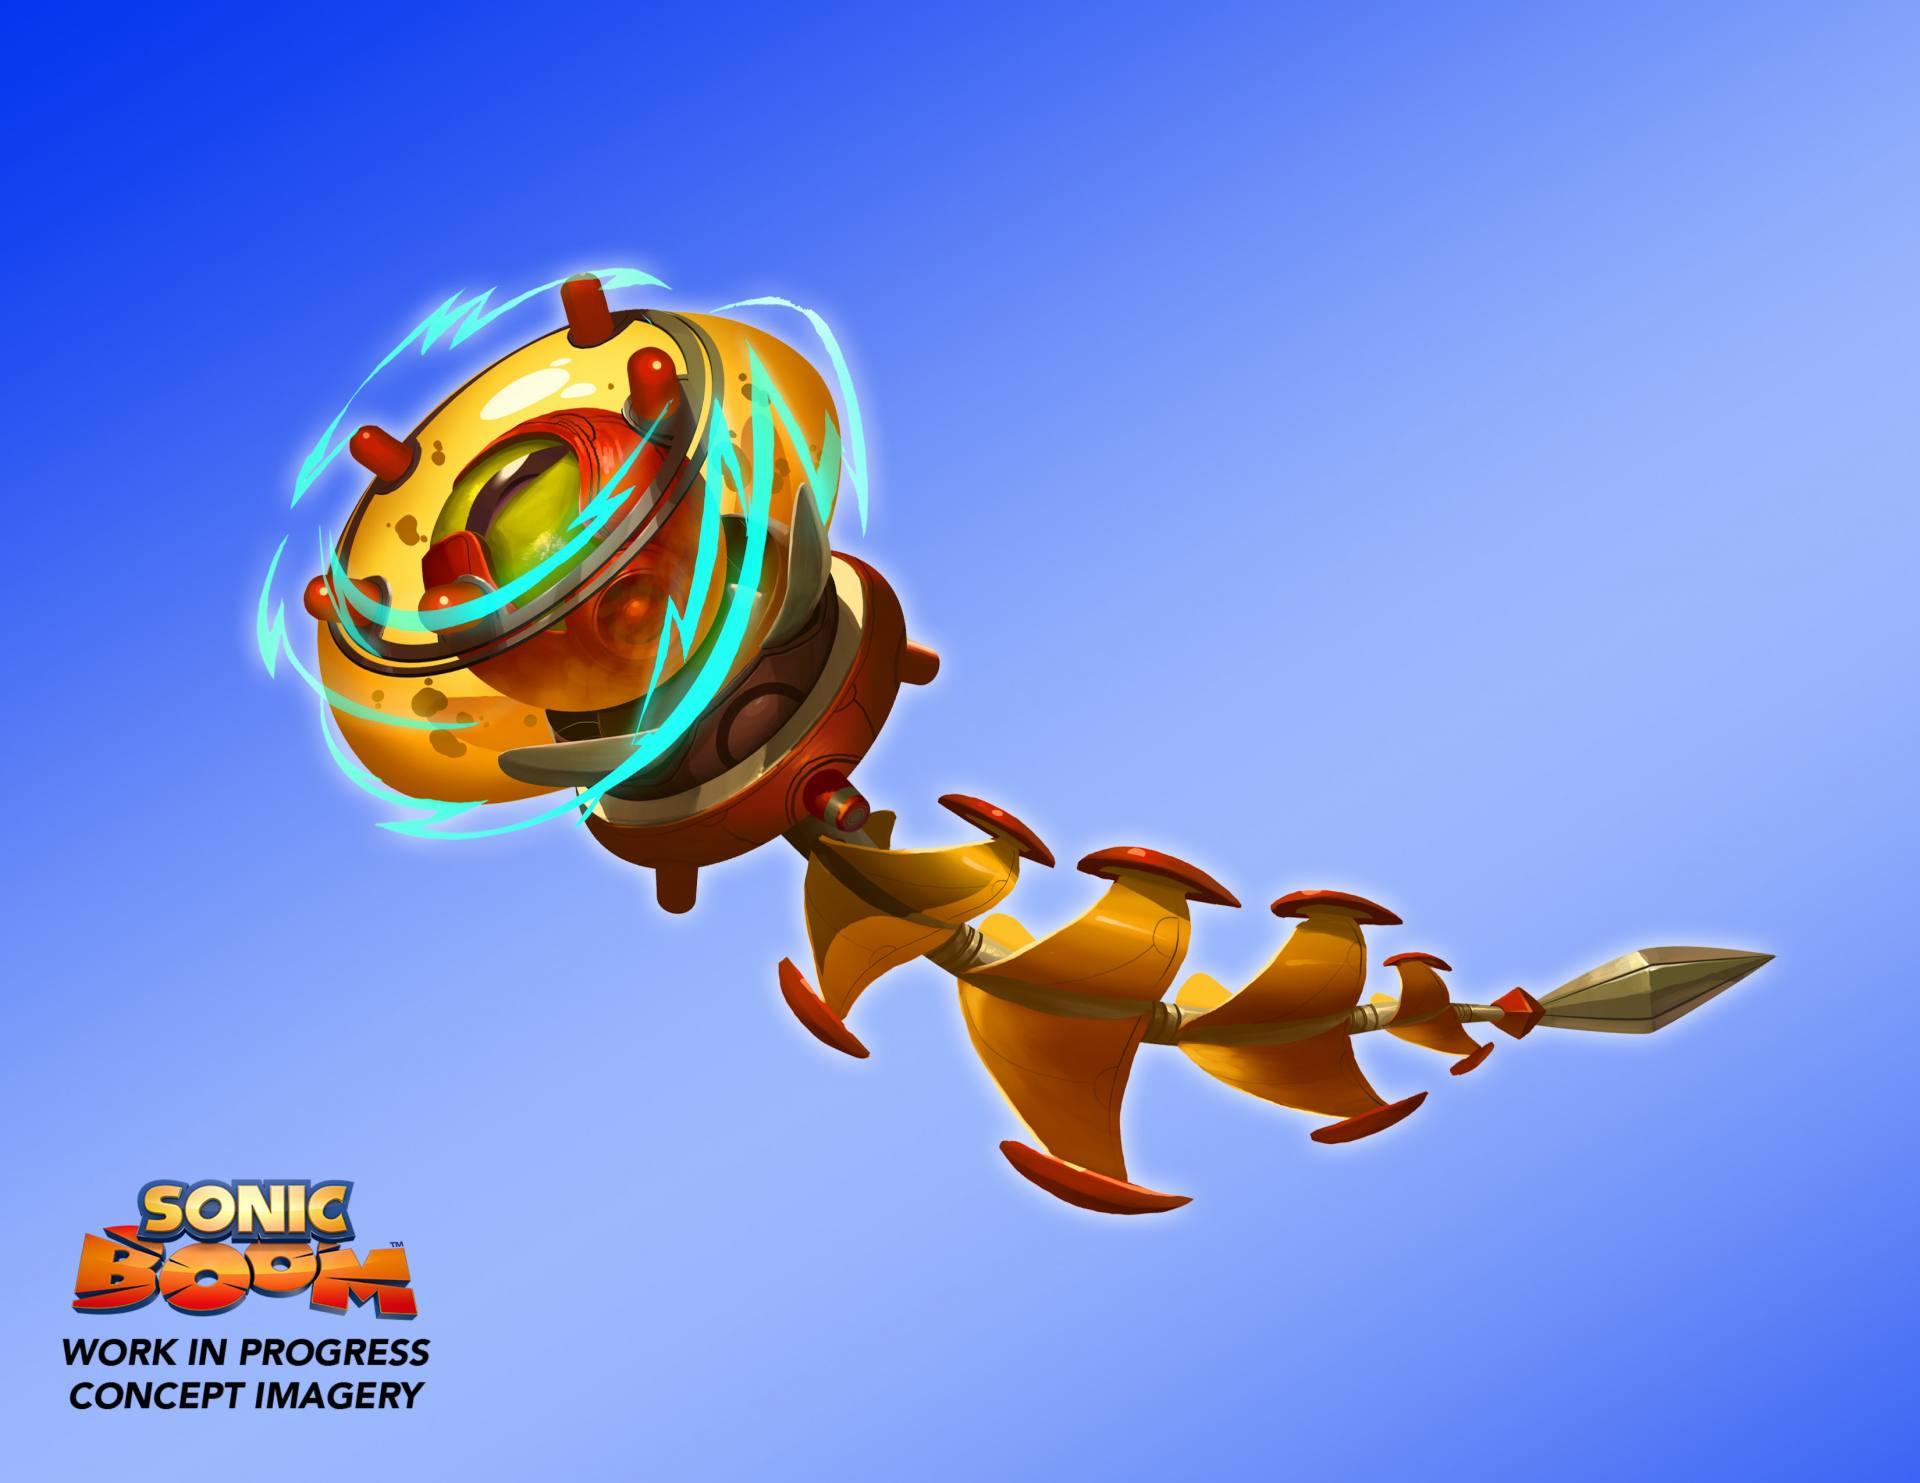 Sonic Boom 14-08-14 Artwork 002